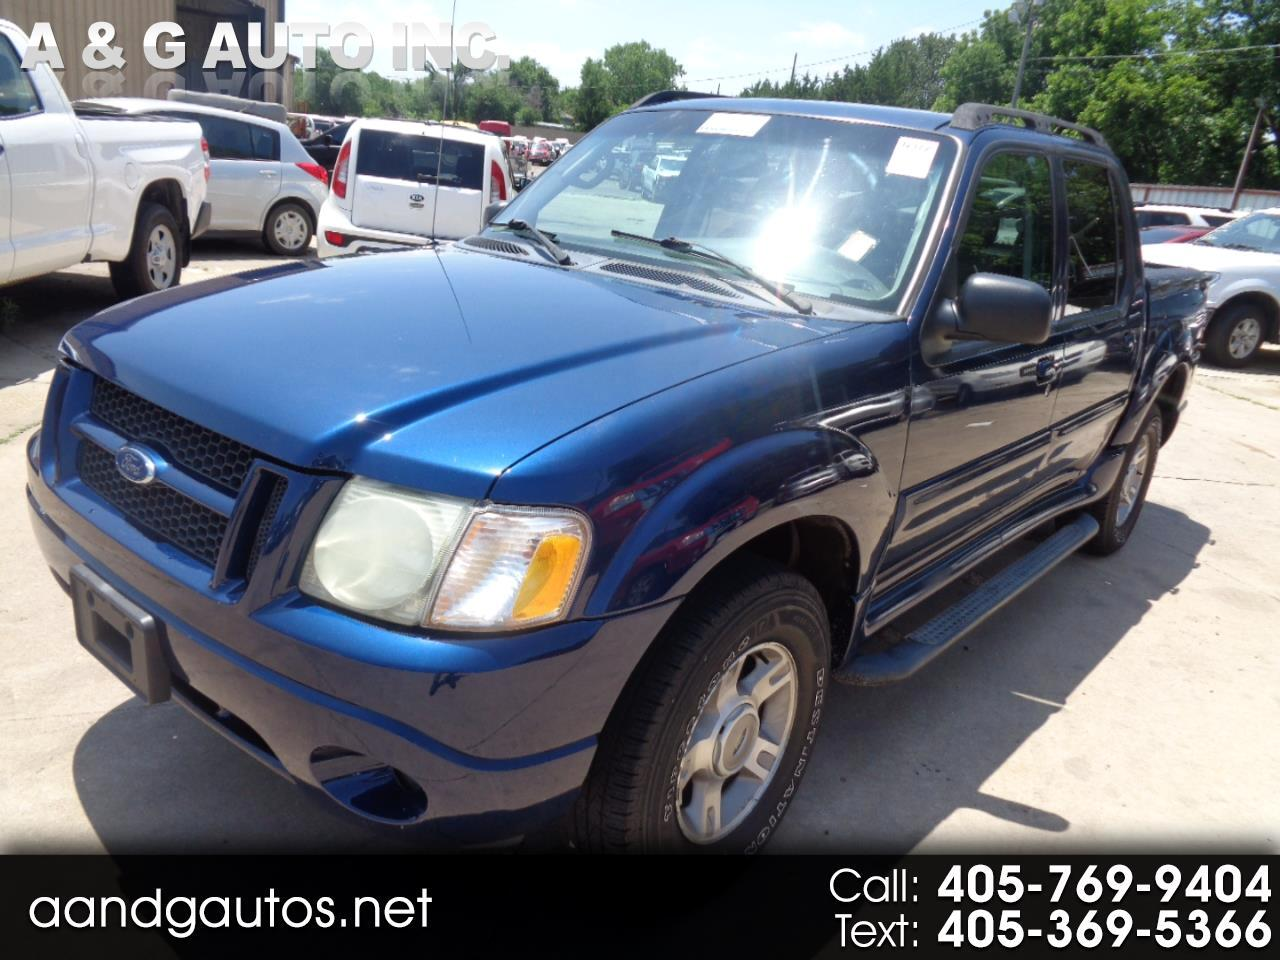 2004 Ford Explorer Sport Trac Adrenalin 2WD